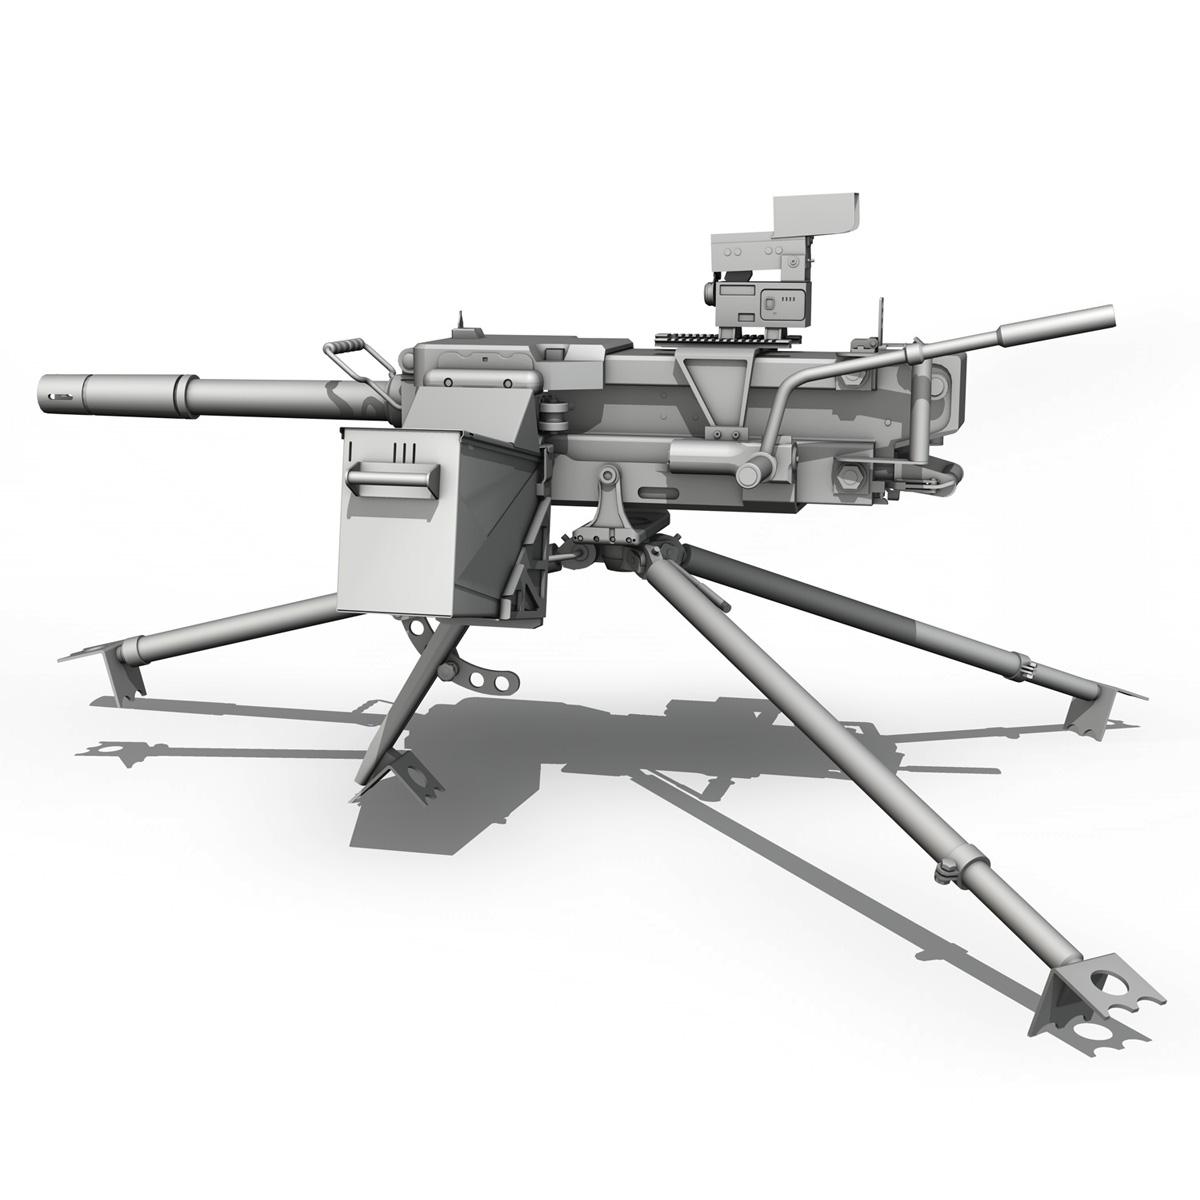 40mm qumbara pulemyotu gmg 3d model c4d lwo 3dm obj 264298